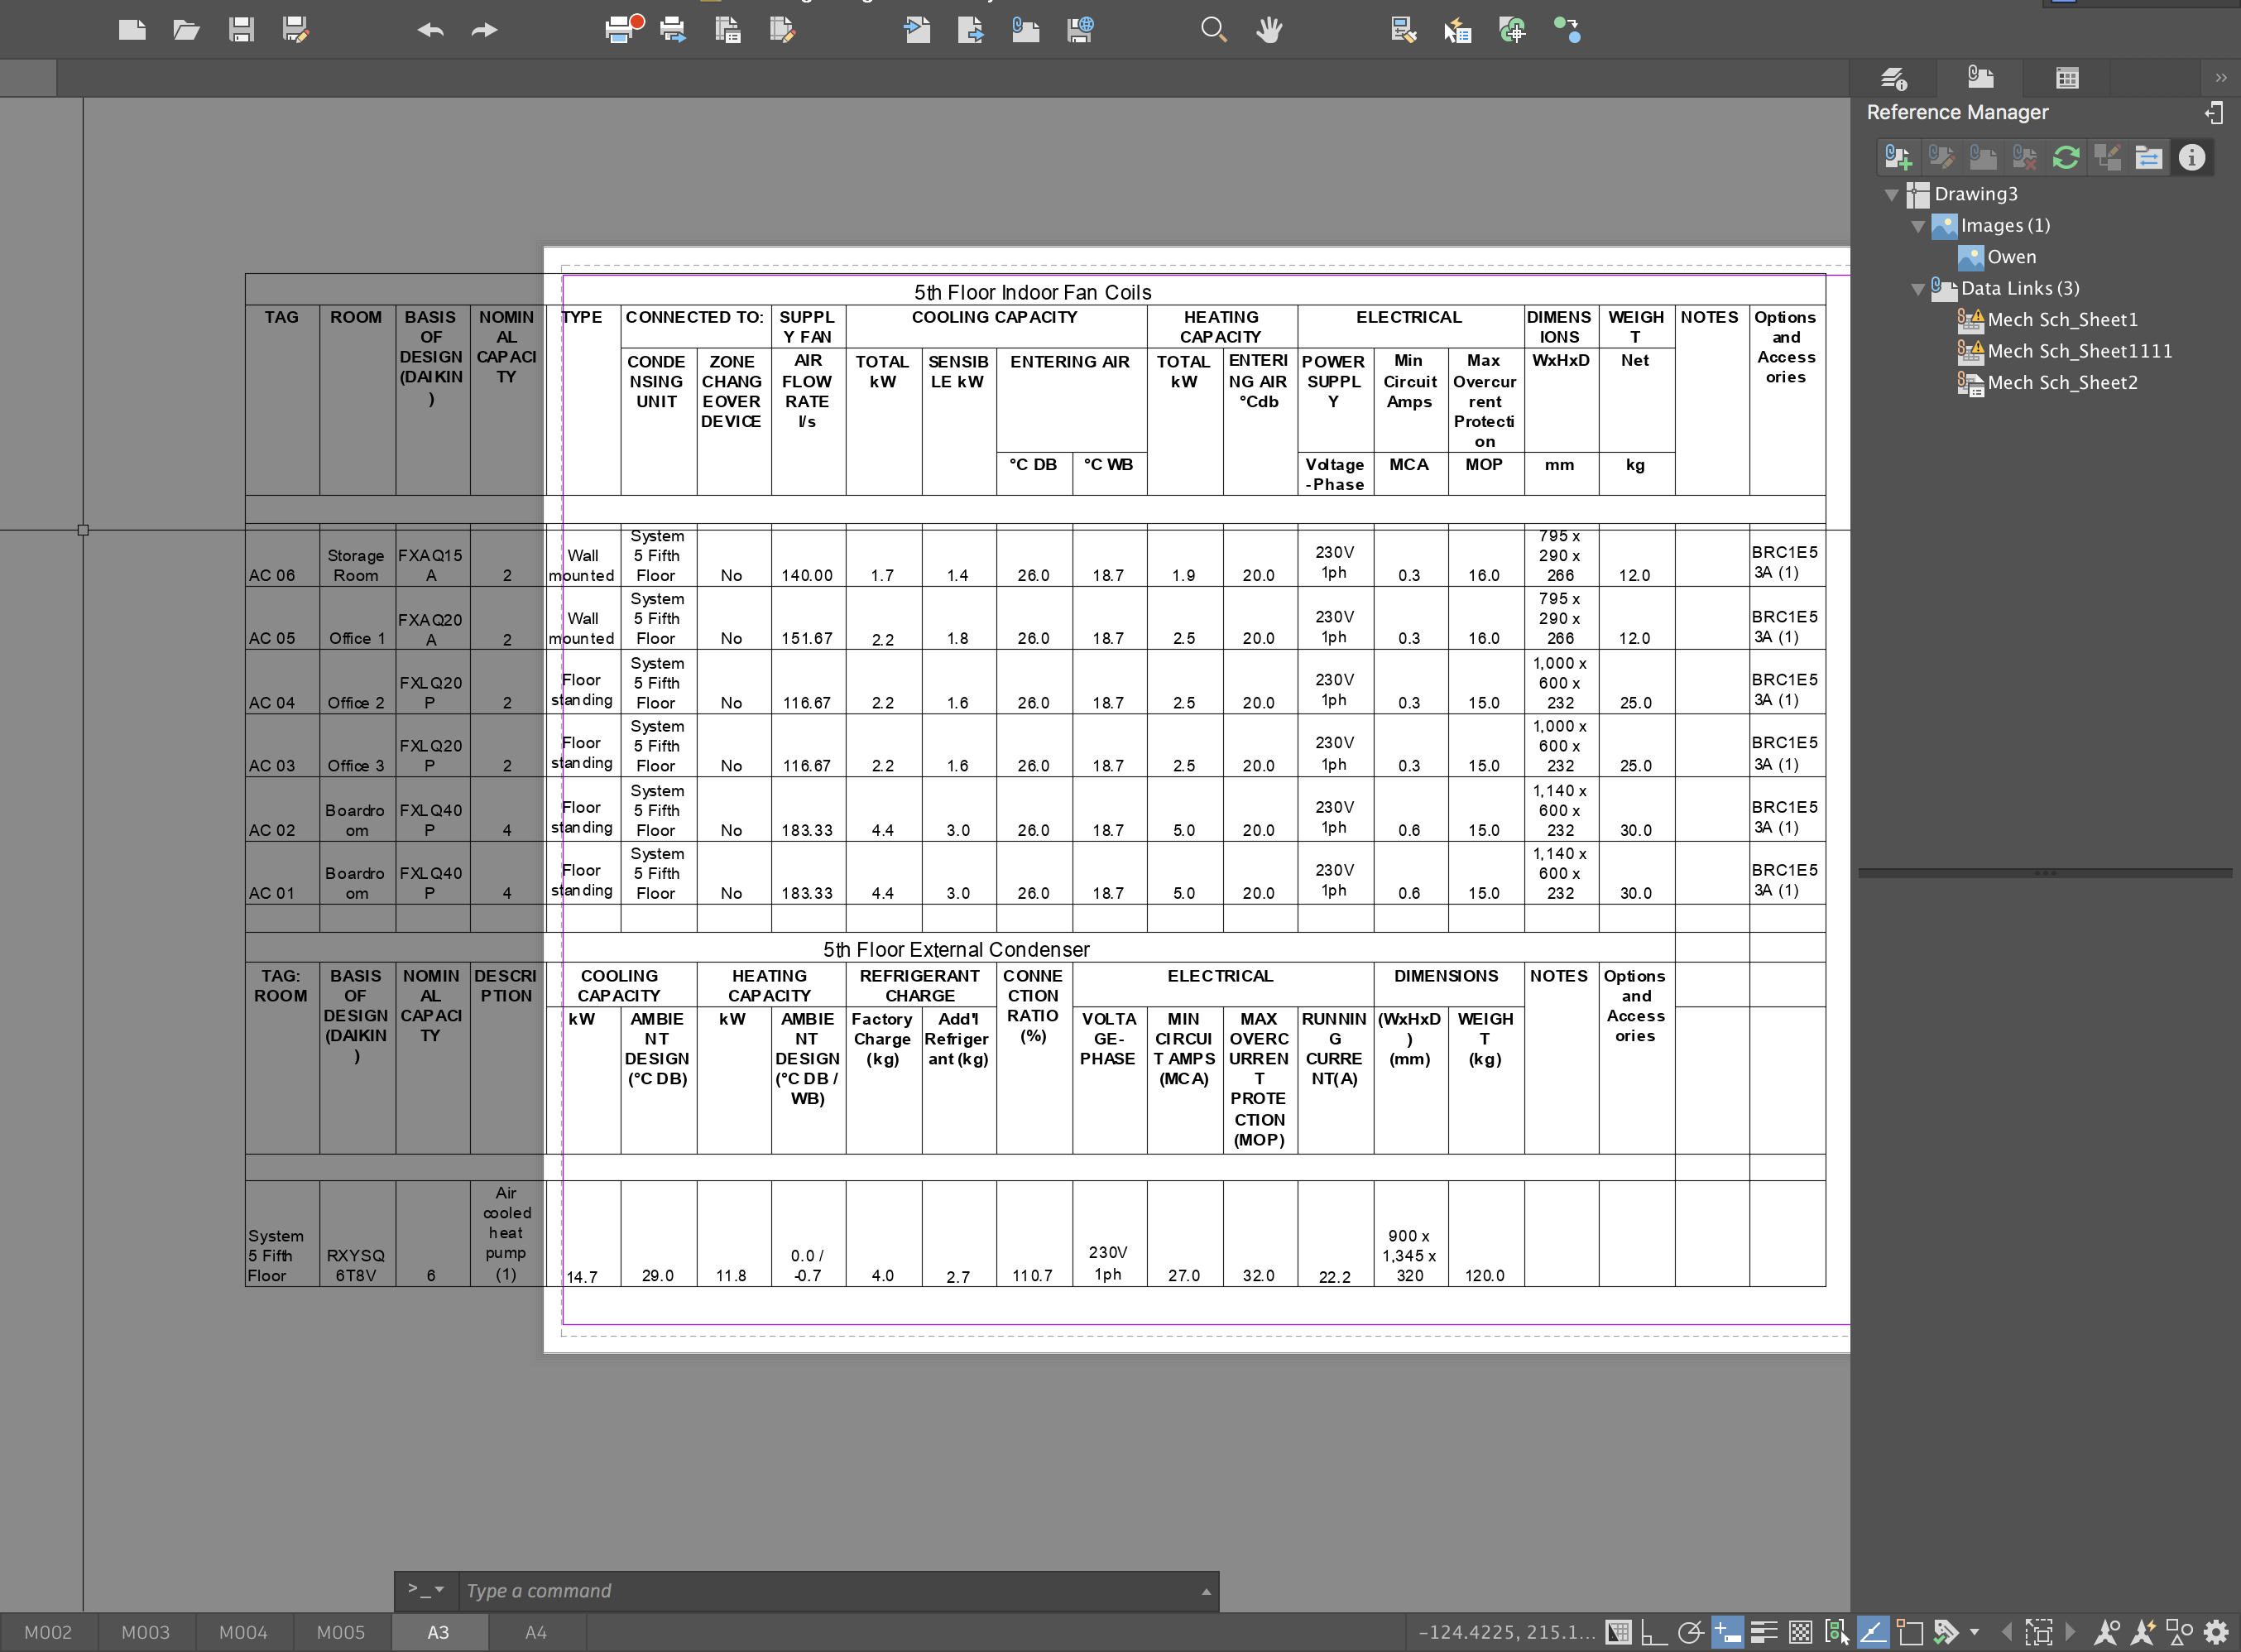 Solved: Autocad LT 2018 MAC Data link - Autodesk Community- AutoCAD